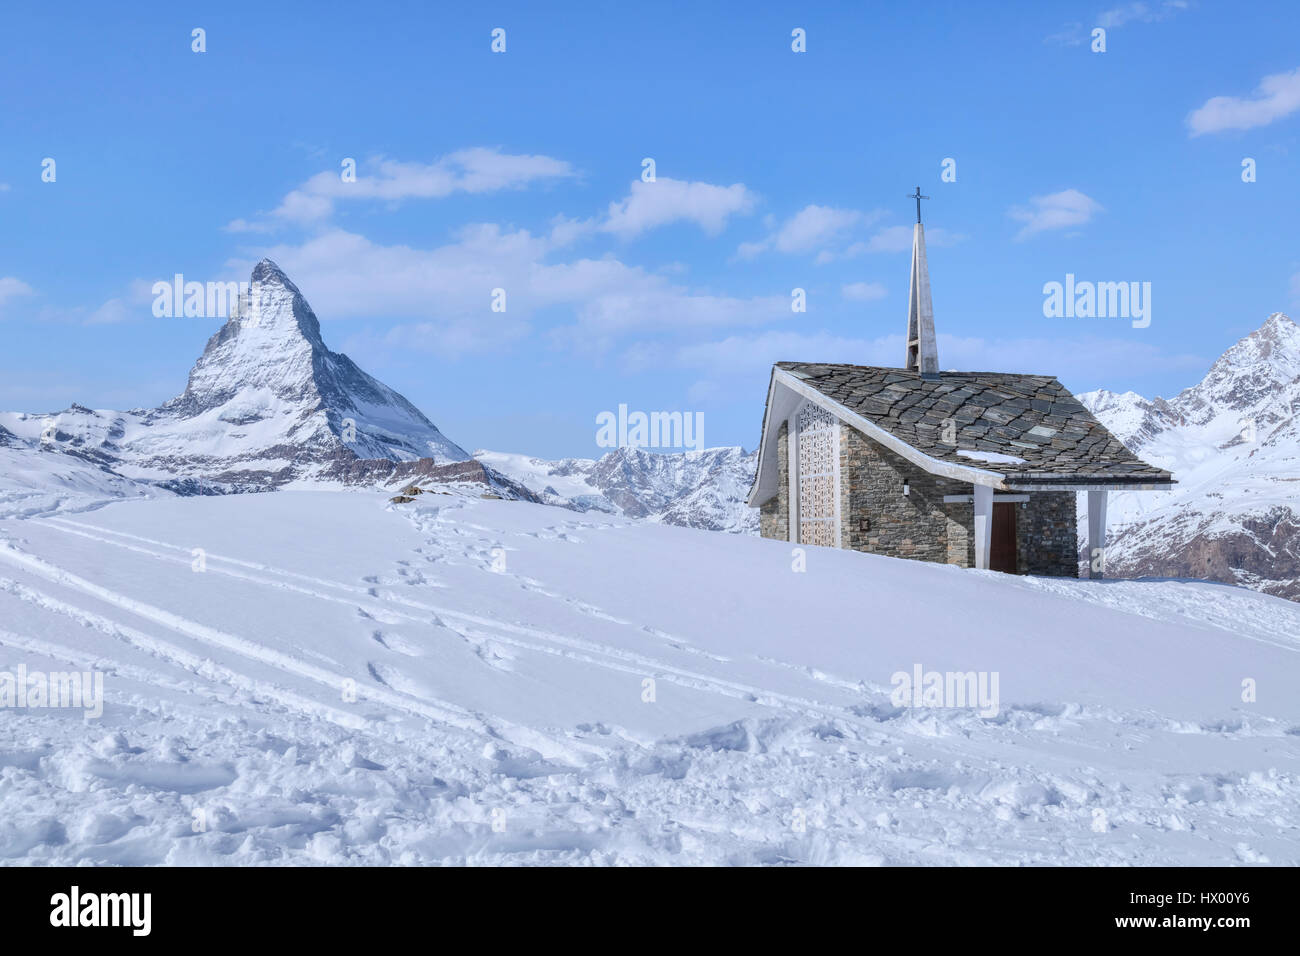 Bruder Klaus, Riffelberg Kapelle, Matterhorn, Zermatt, Gornergrat, Valais, Switzerland, Europe - Stock Image